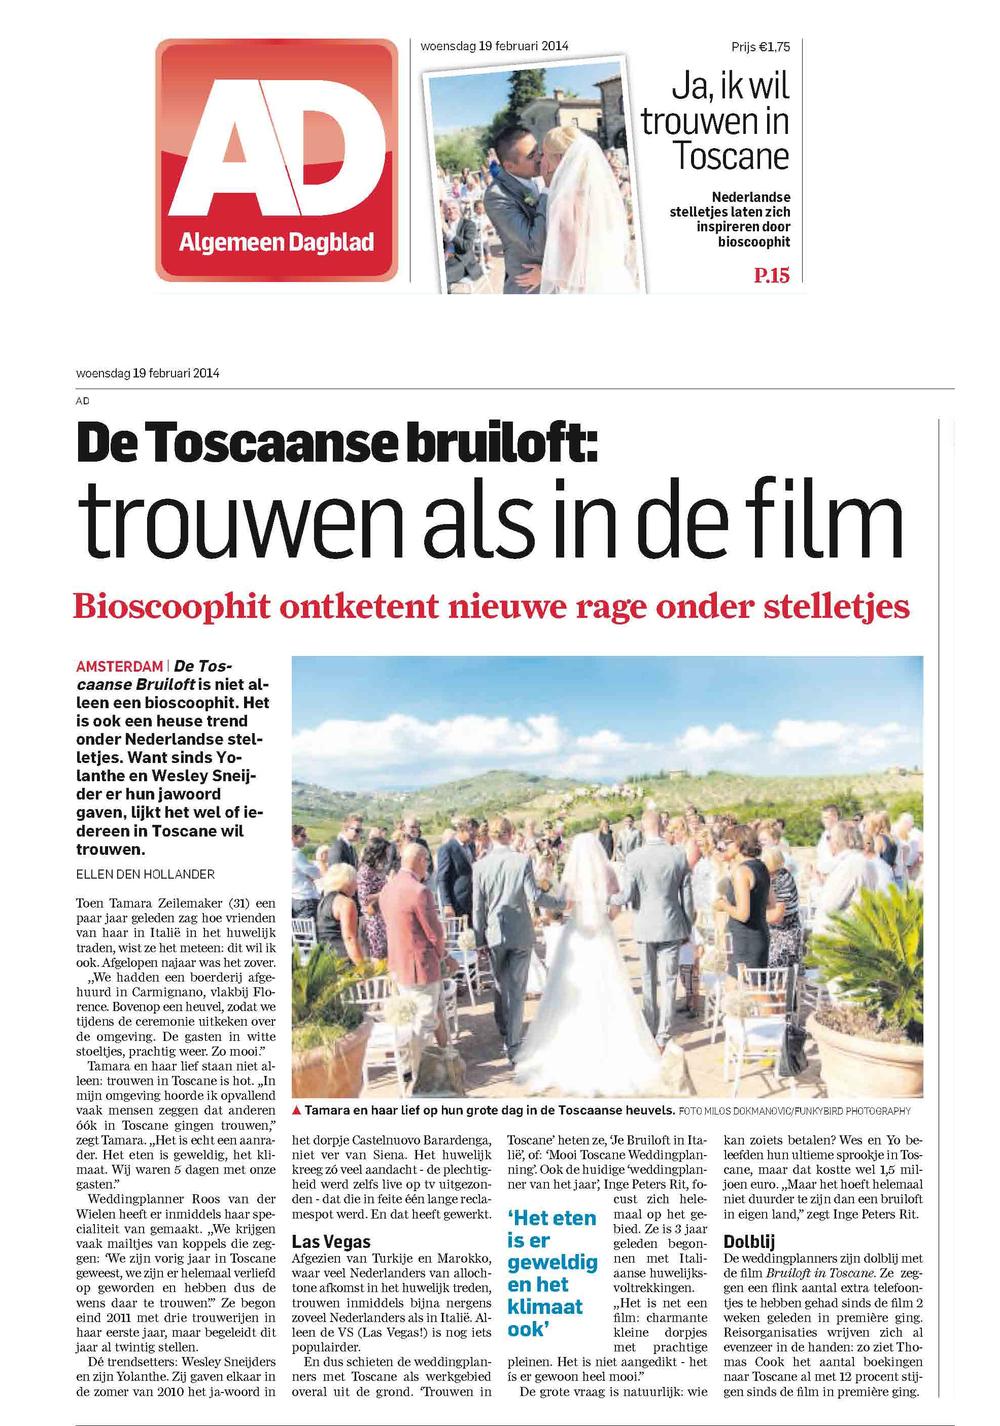 Trouwen in toscane Algemeen Dagblad 3-2.jpg